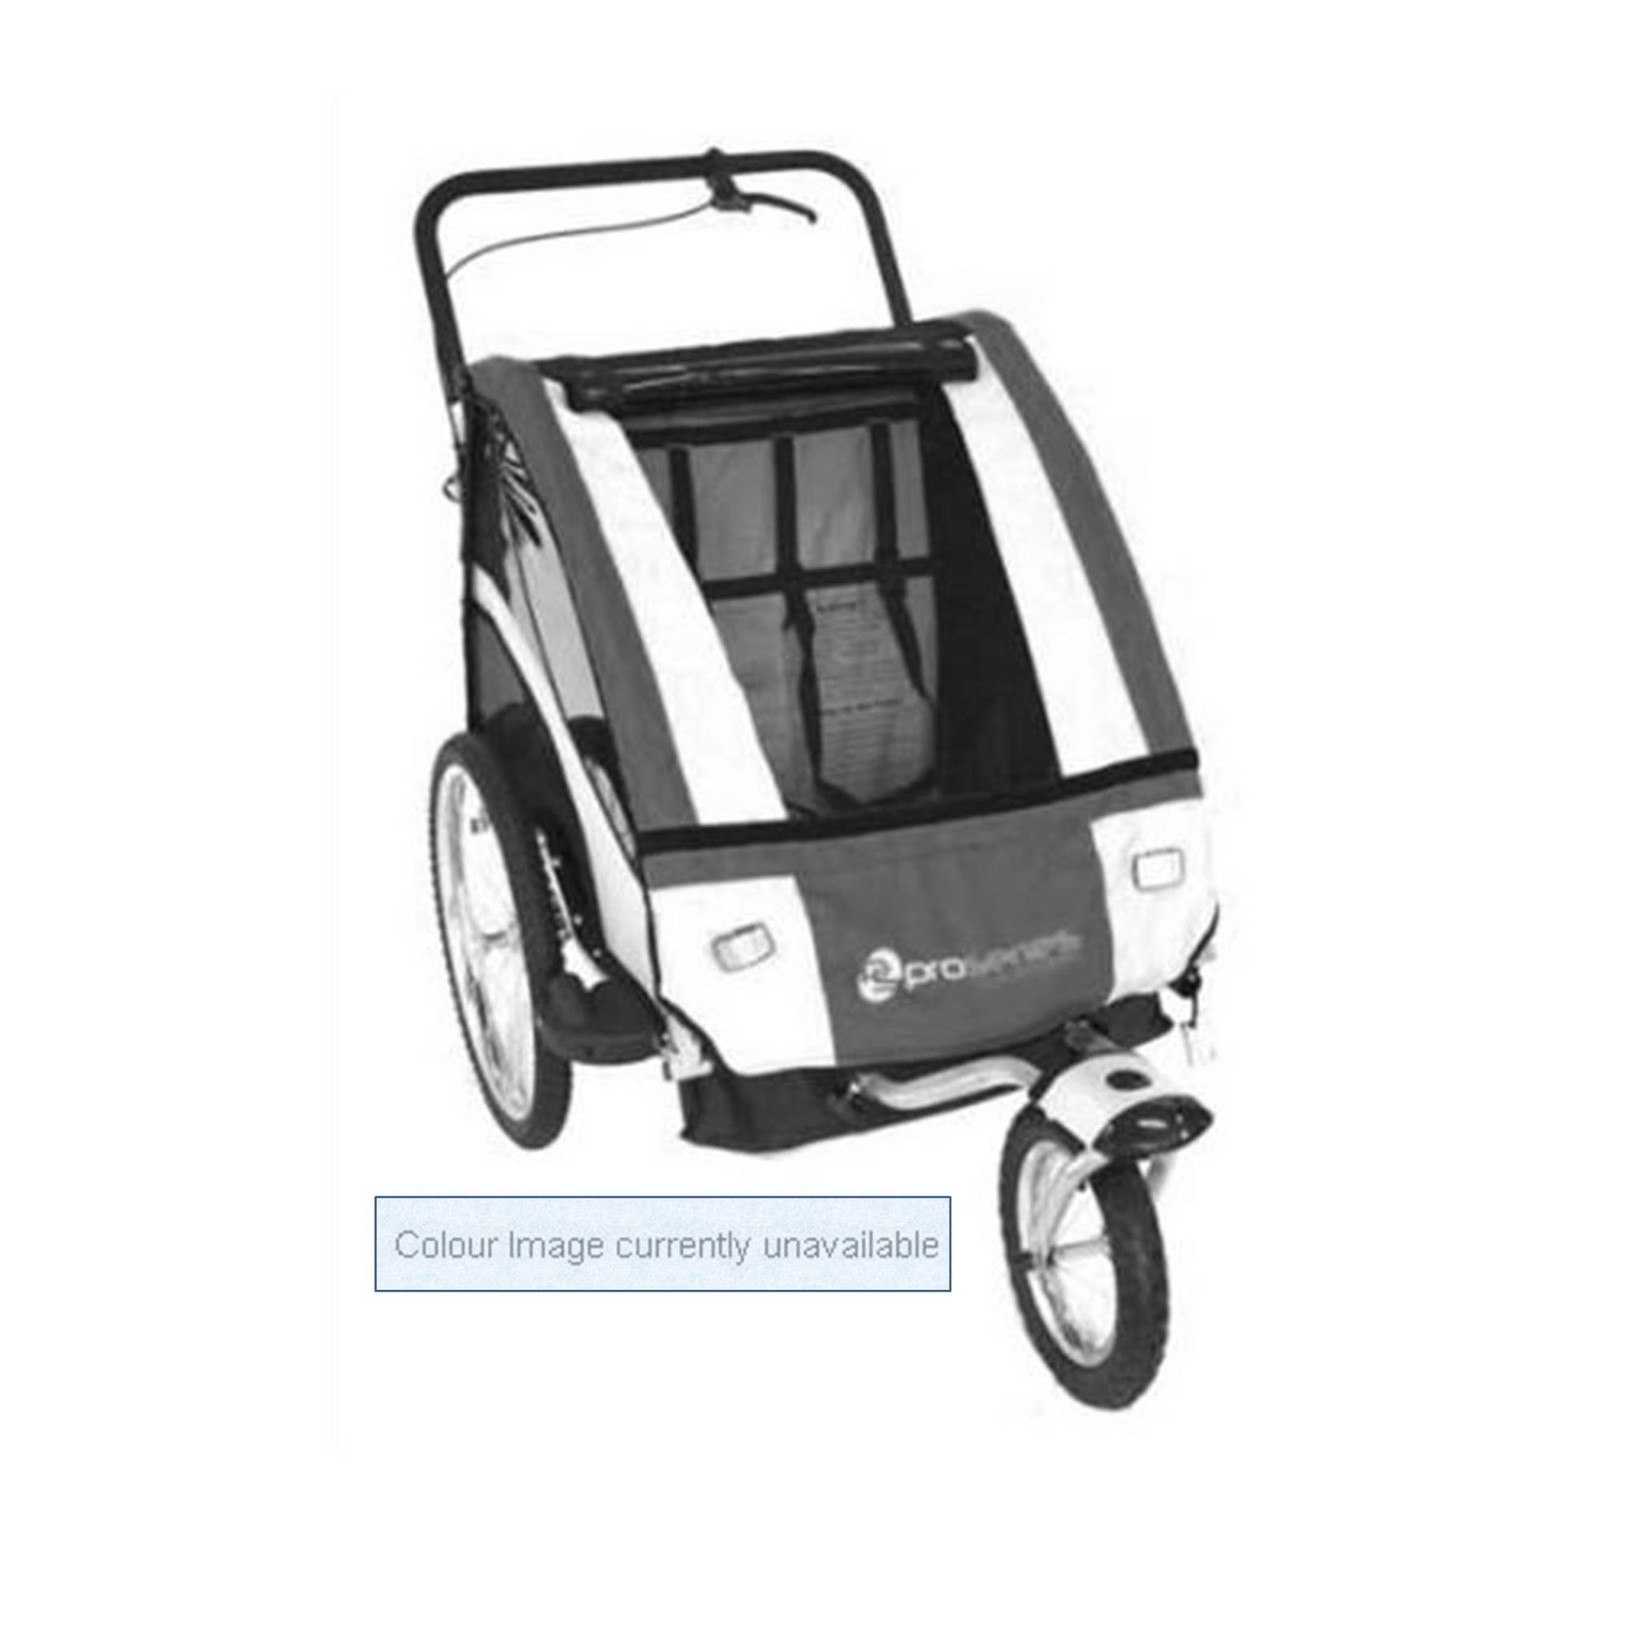 Pro Series Steel 2 In 1 Trailer/Stroller - 2 Child - Blue